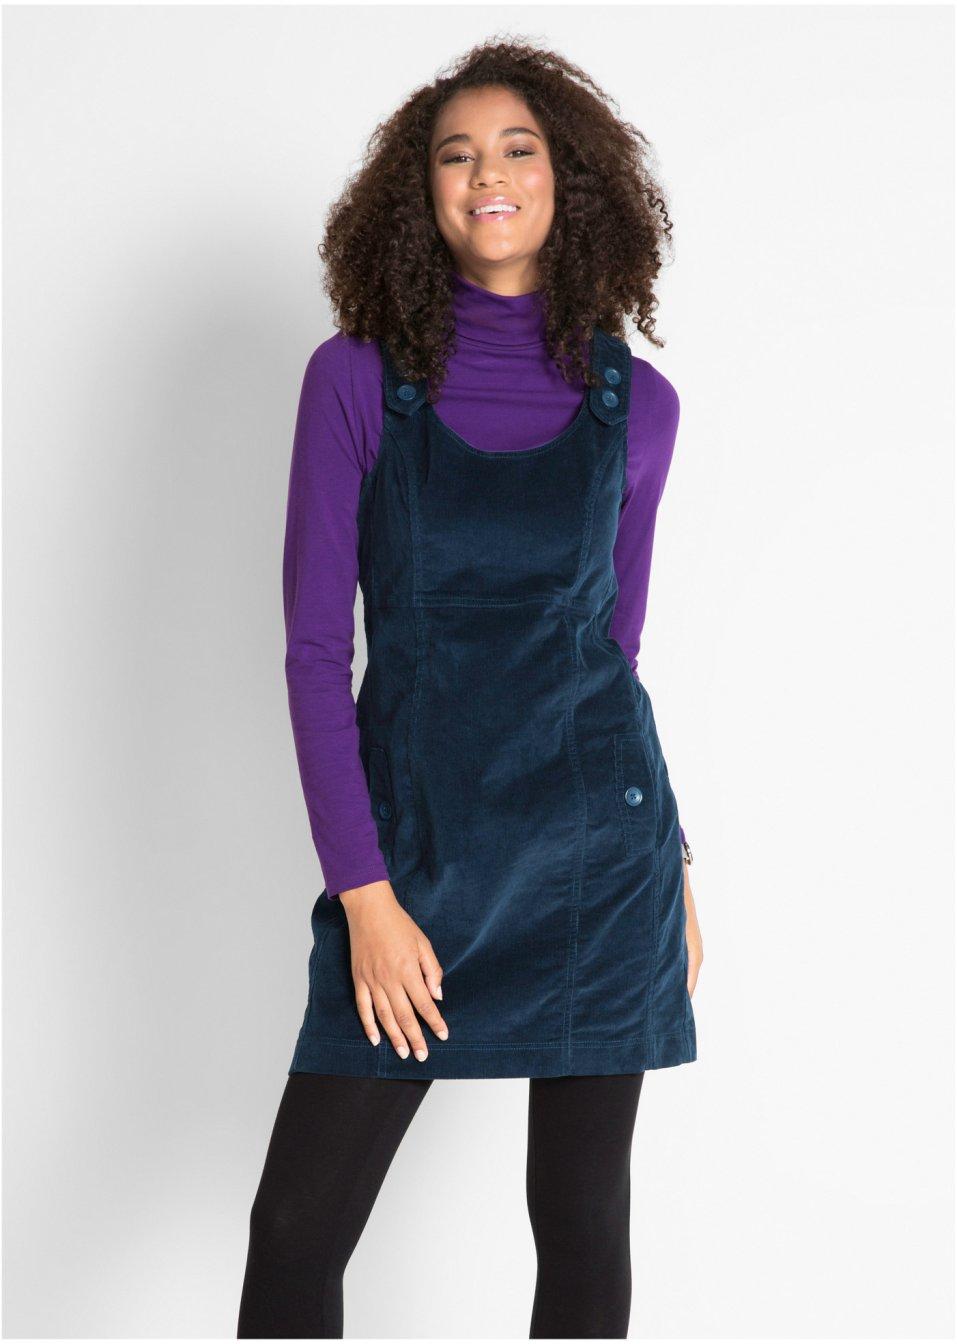 a39377db1c6ffa Kleid aus Cord mit Trägern - dunkelblau